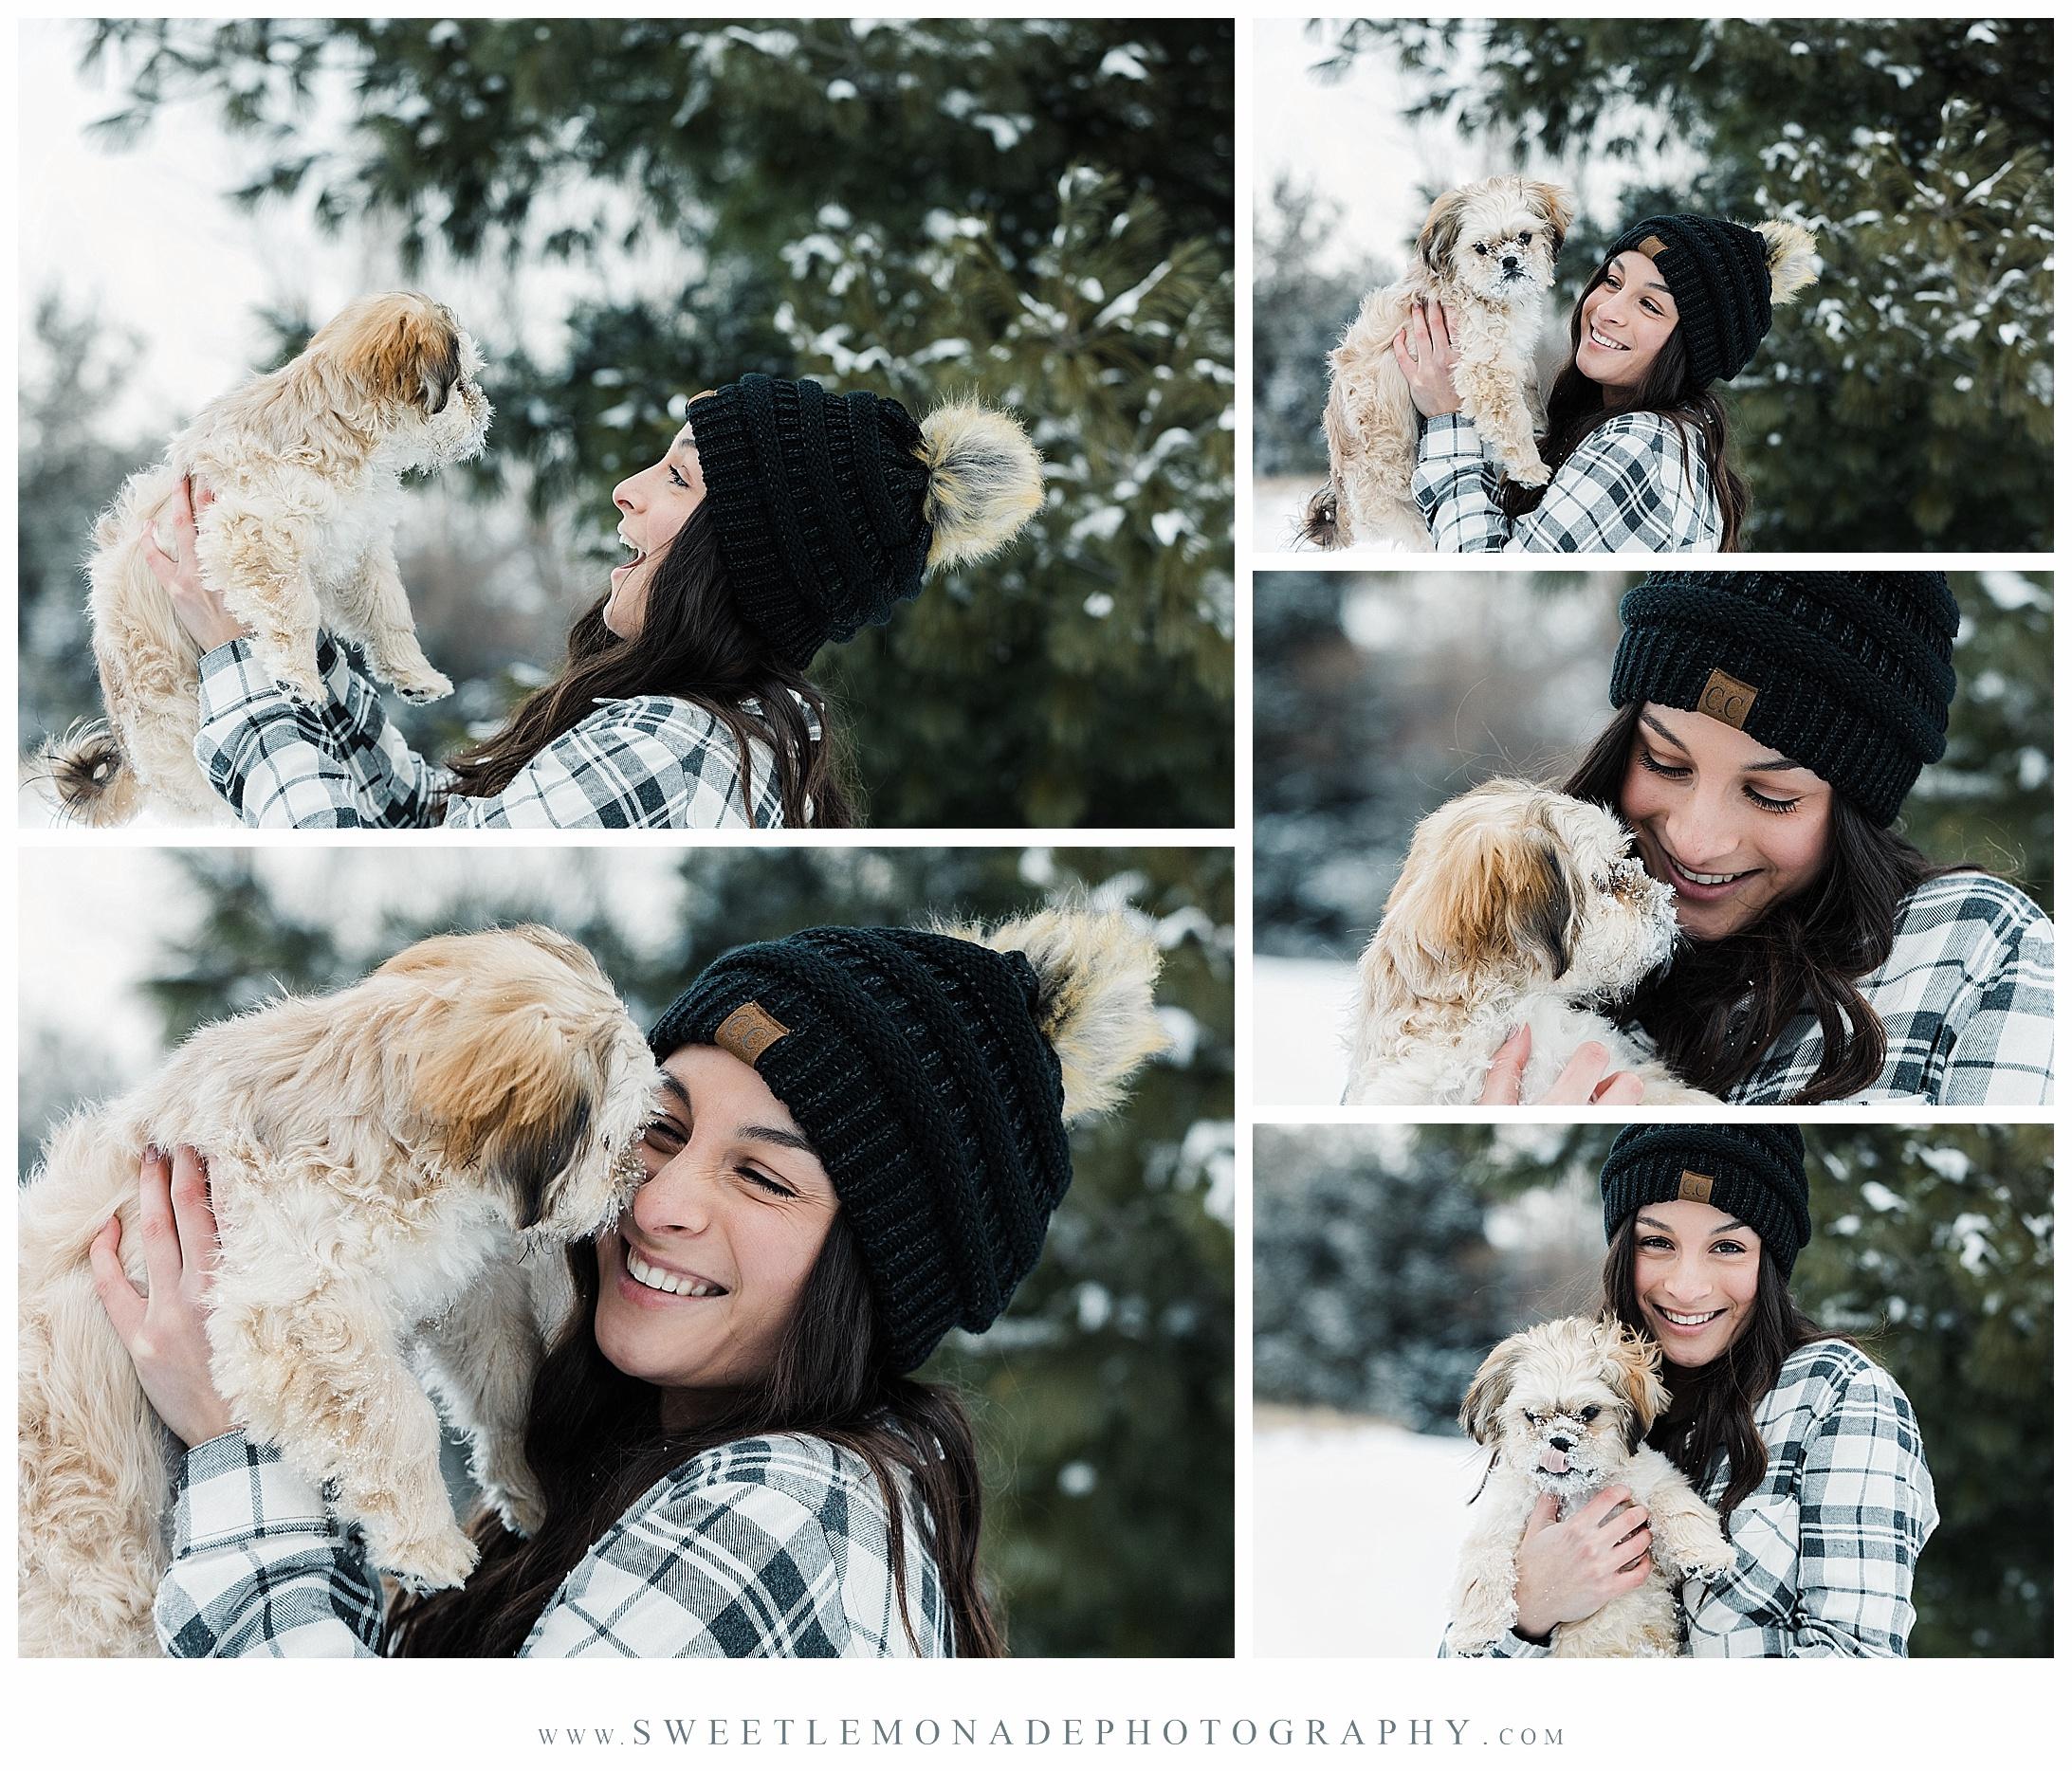 mahomet-illinois-snow-senior-pics-winter-dog-sweet-lemonade-photography_2080.jpg